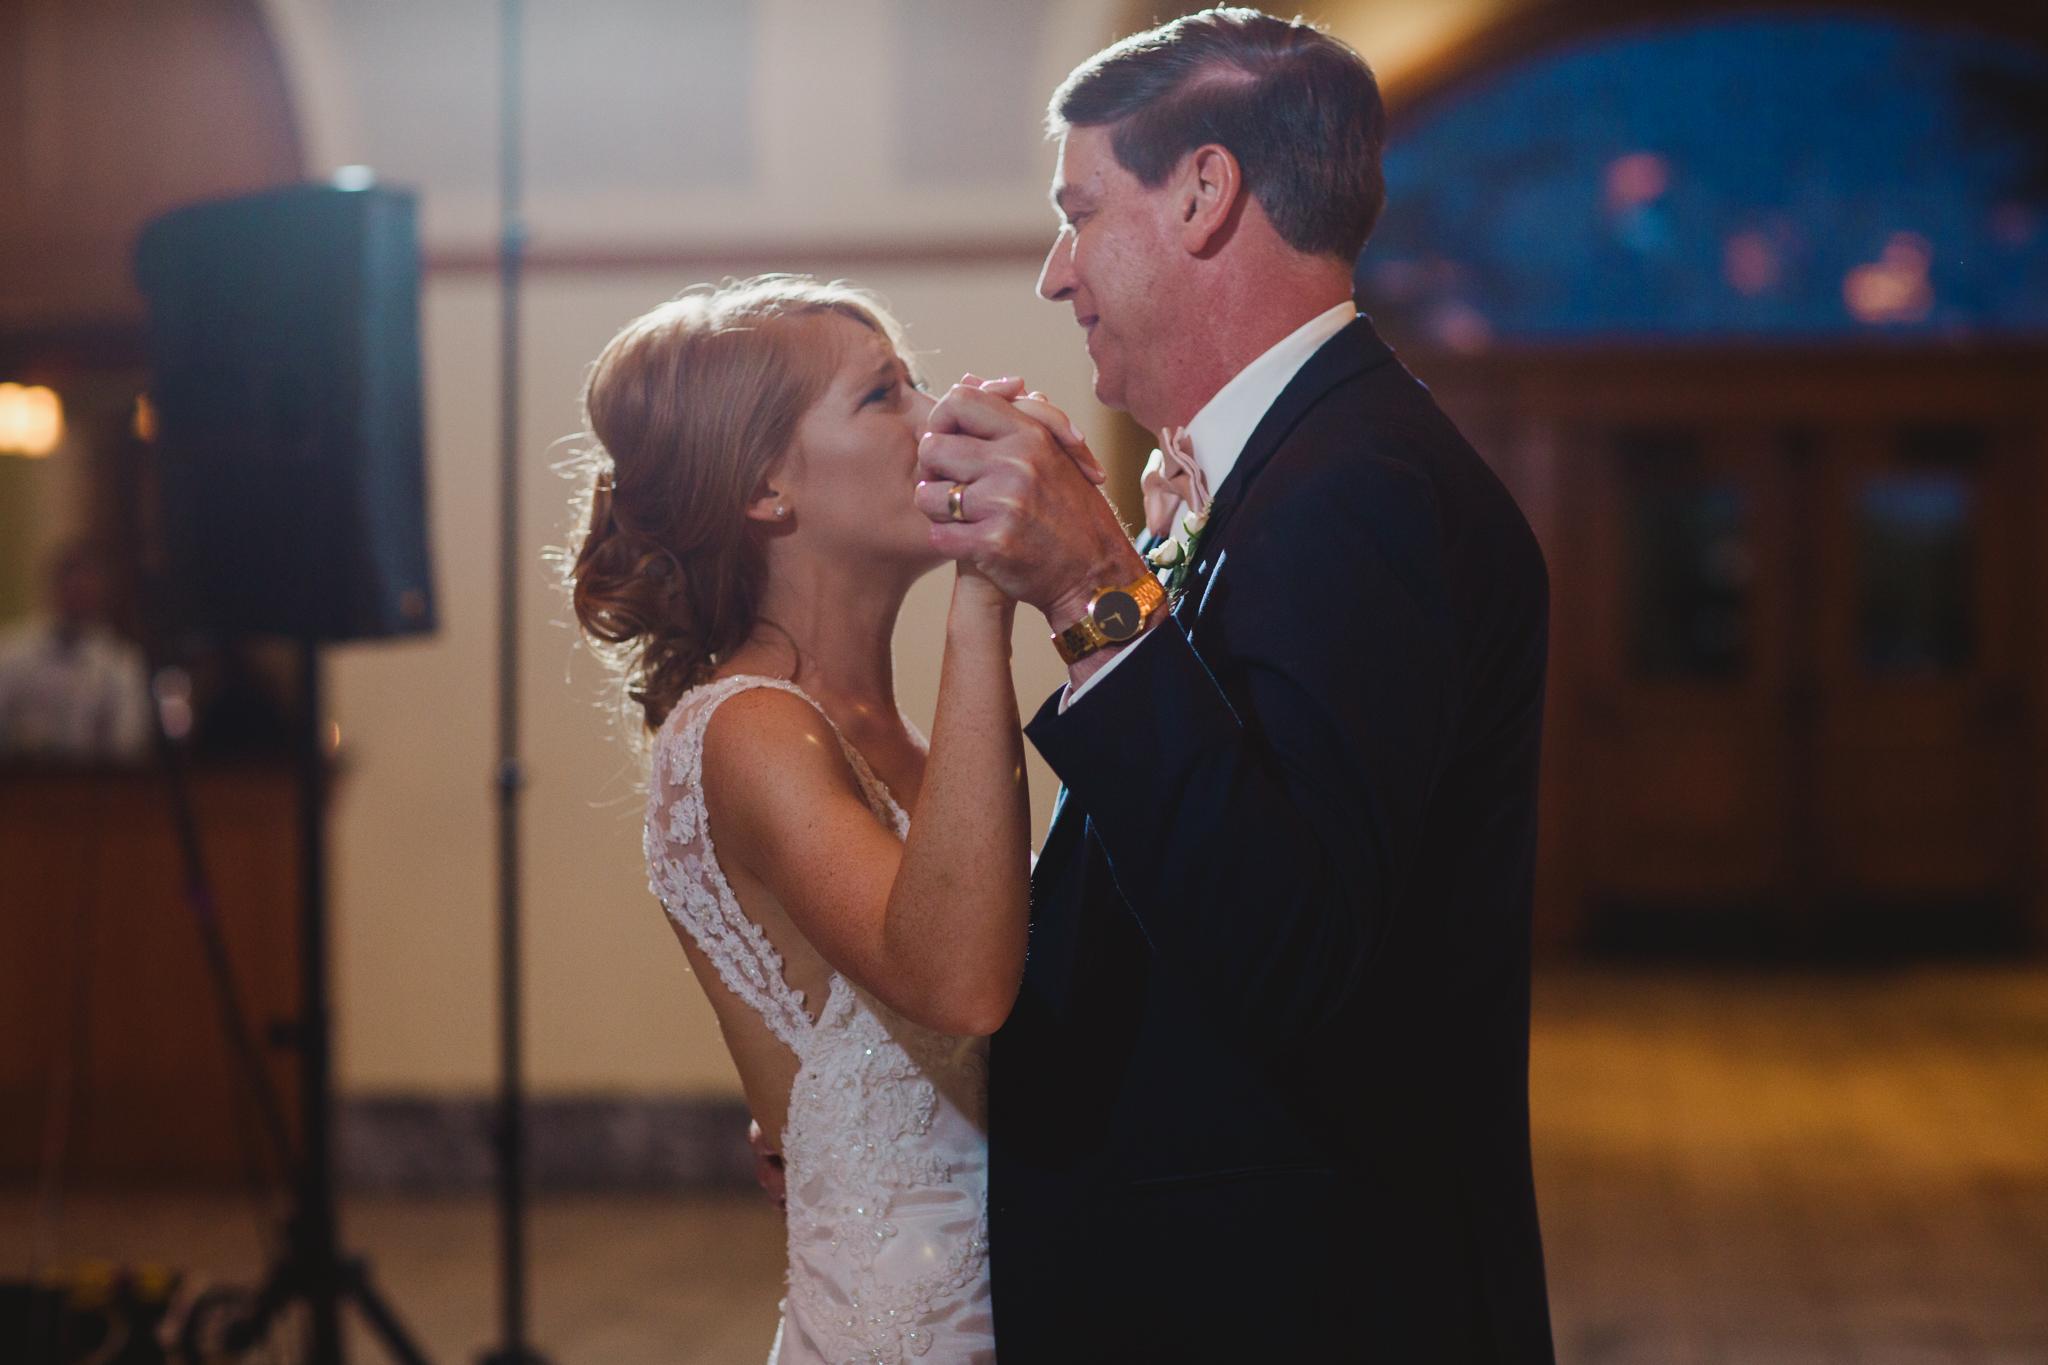 Michael and Kelly - the ashton depot - wedding DFW - wedding photographer- elizalde photography (115 of 150).jpg